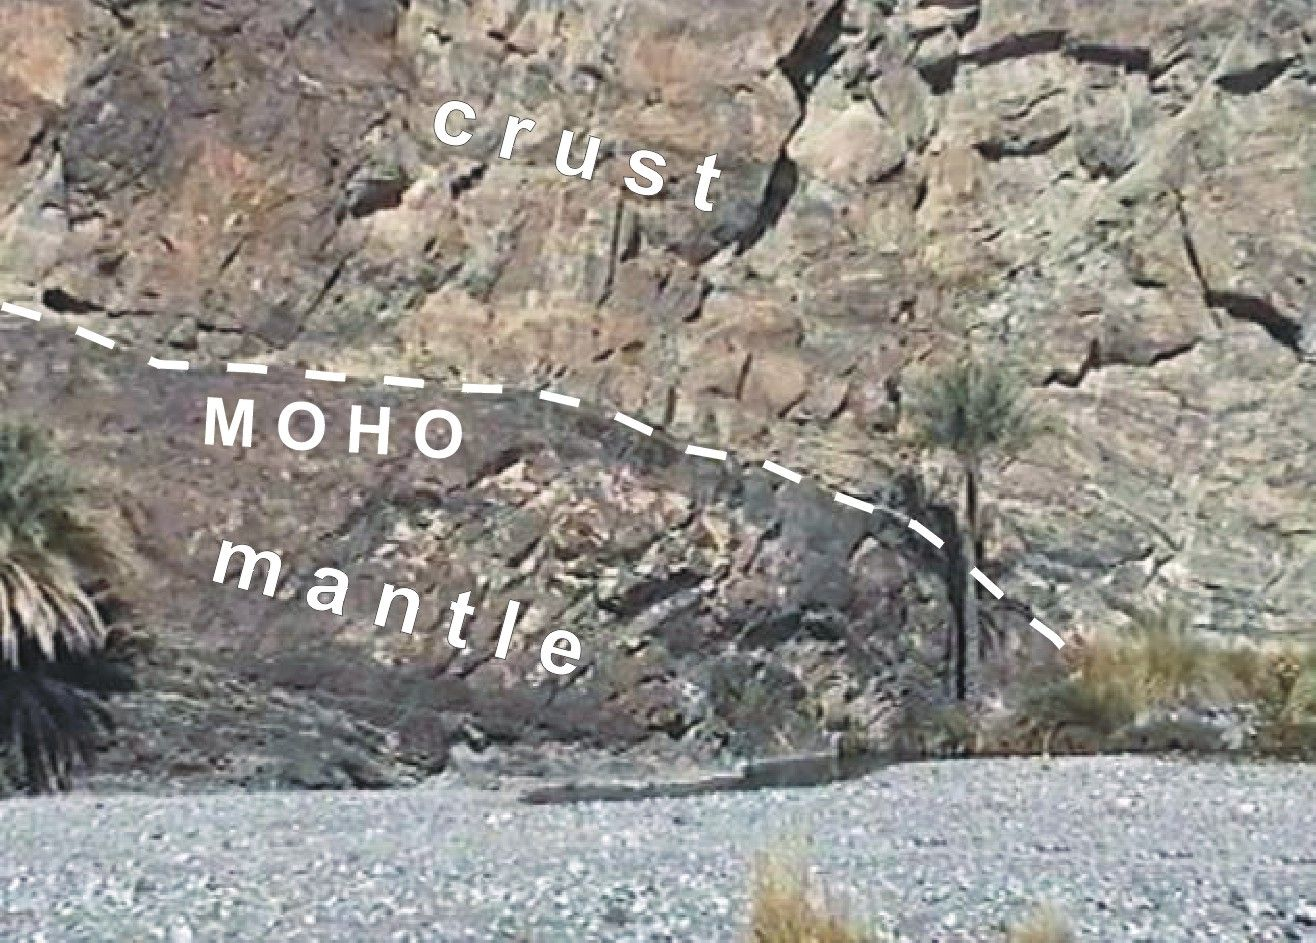 Oman  Oman 2002 www.geo.tu-freiberg.de1316 × 943Ricerca tramite immagine The MOHO in Wadi Abyad (the classical...)